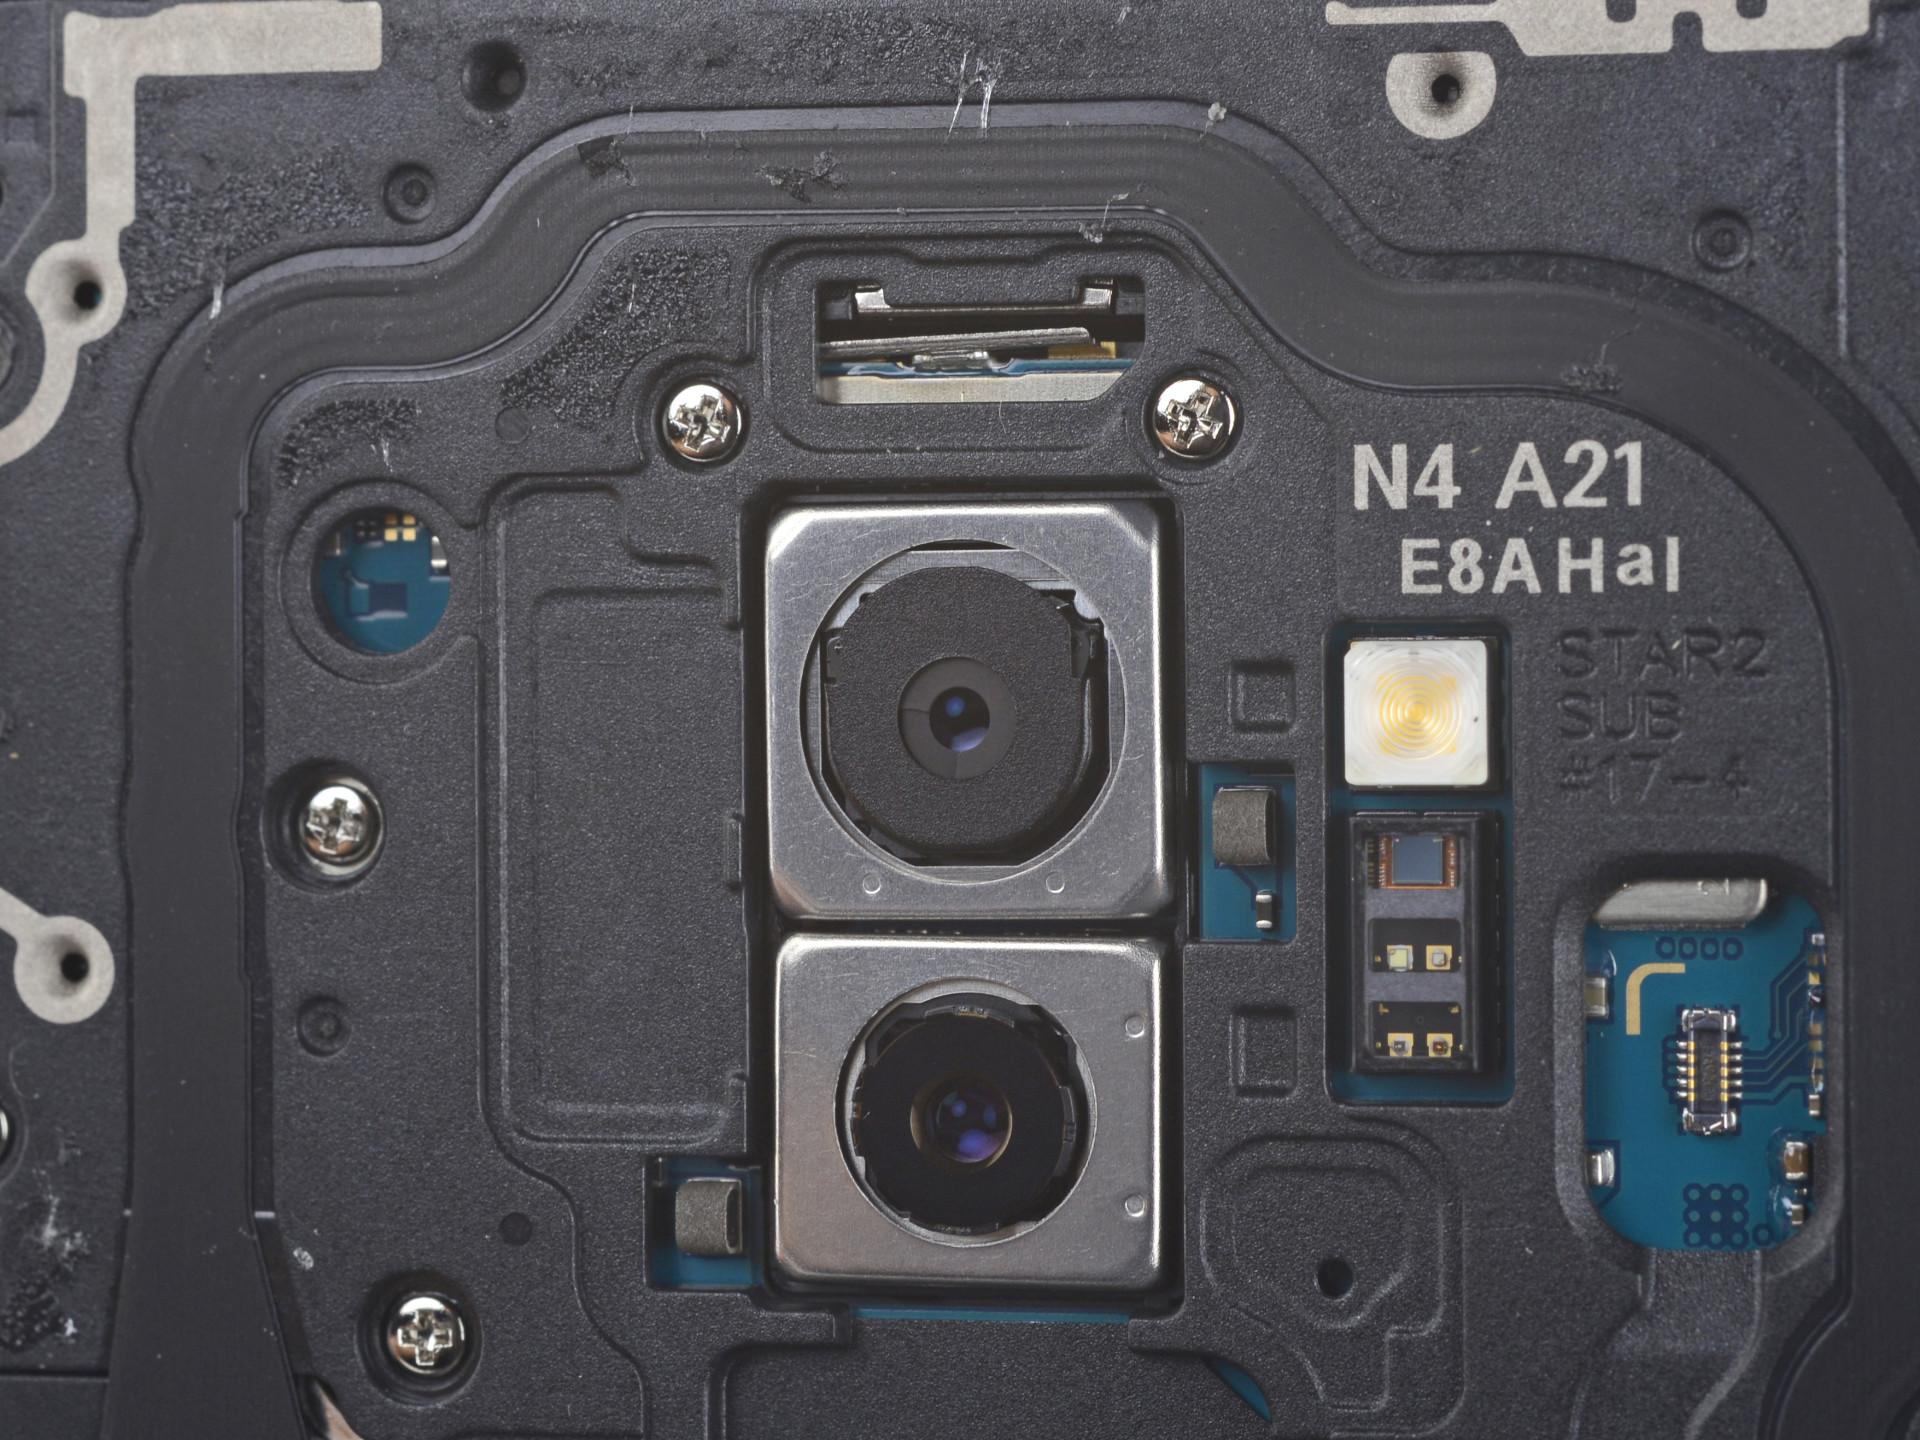 O Galaxy S9 já foi desmontado e pode ver o interior